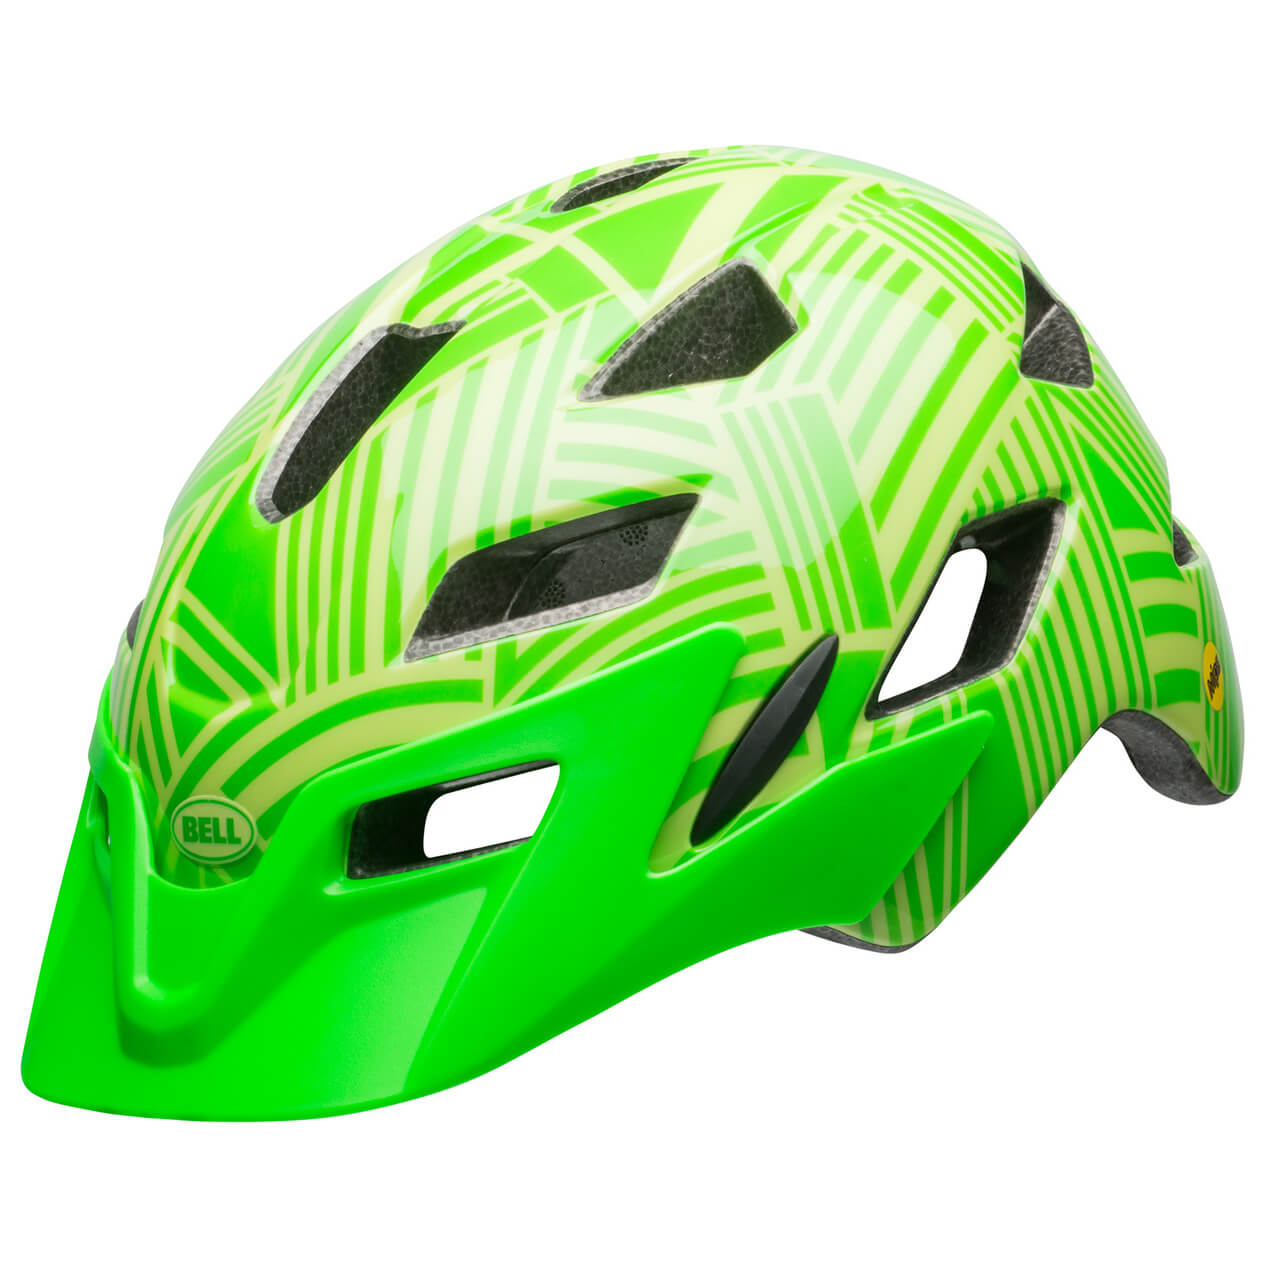 Bell Sidetrack Youth Mips 17 - Cykelhjälm Barn köp online ... 7e9b917e7d359